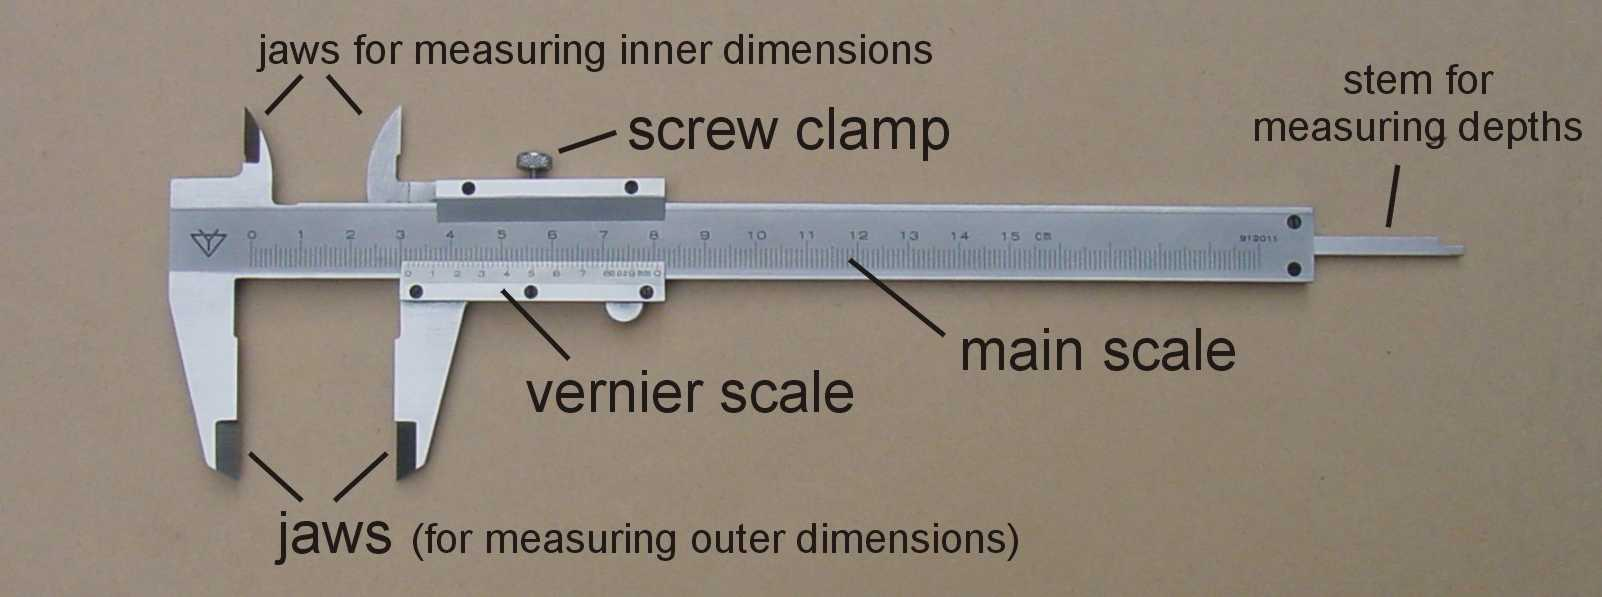 How To Use Vernier Caliper >> Using The Vernier Calipers Micrometer Screw Gauge